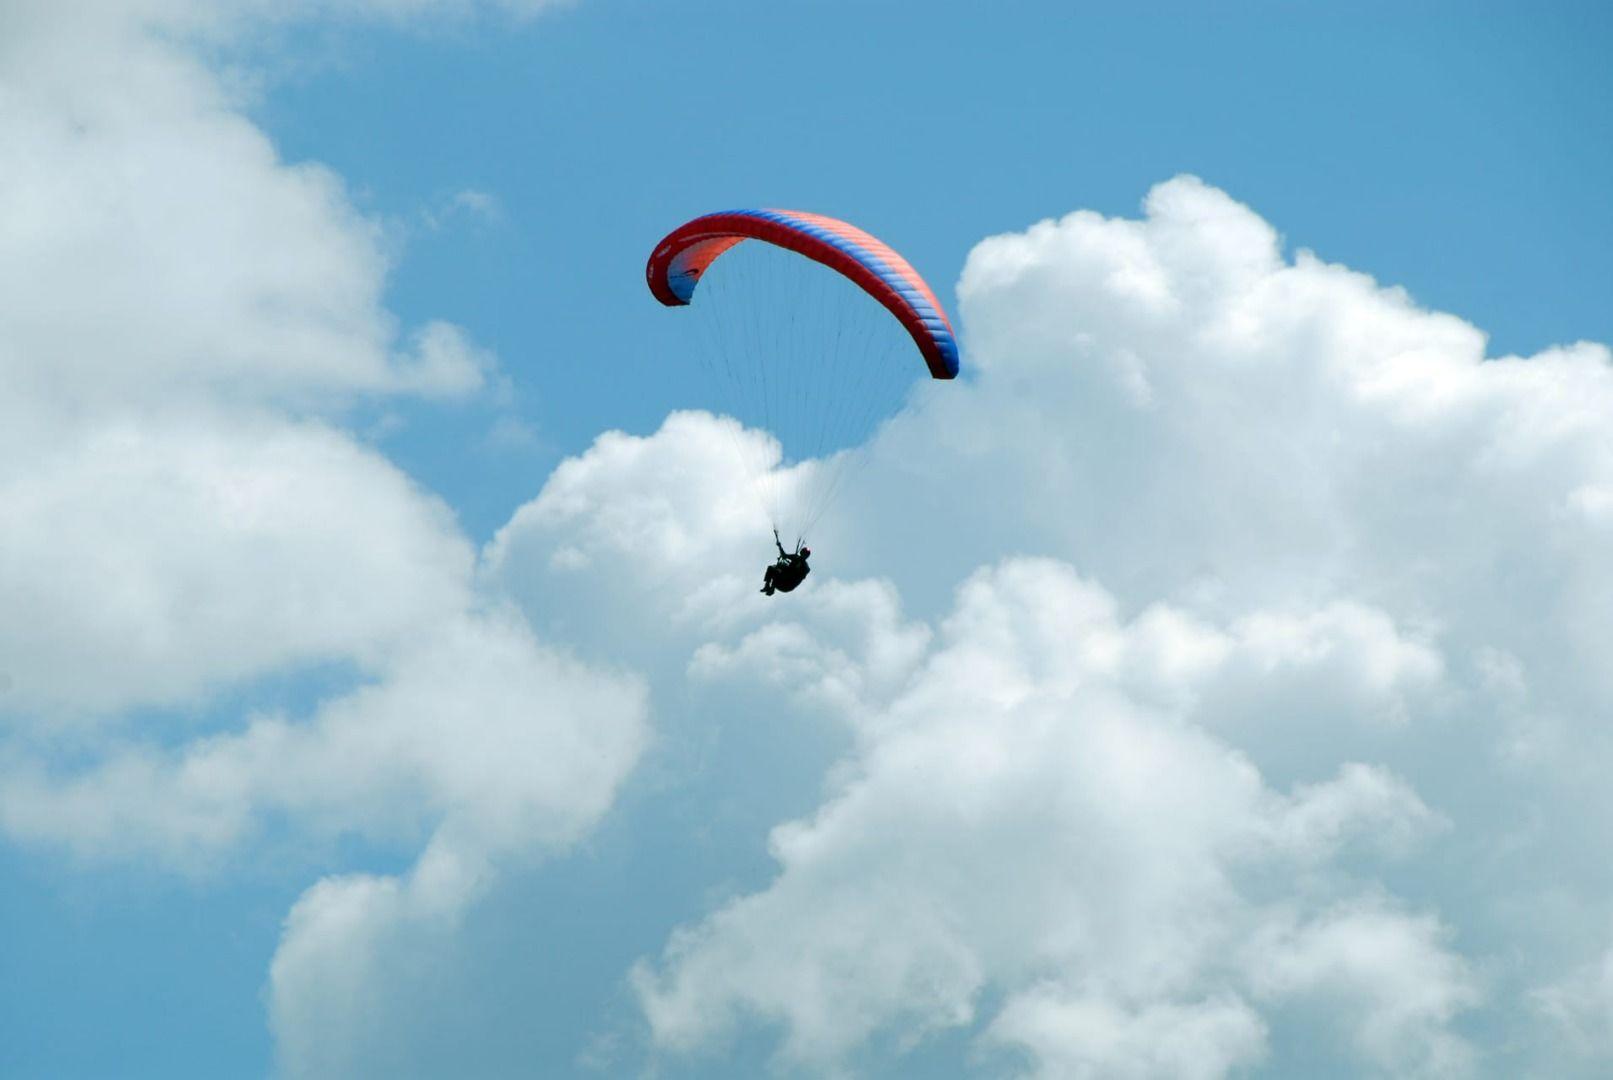 Paragliding - hang gliding